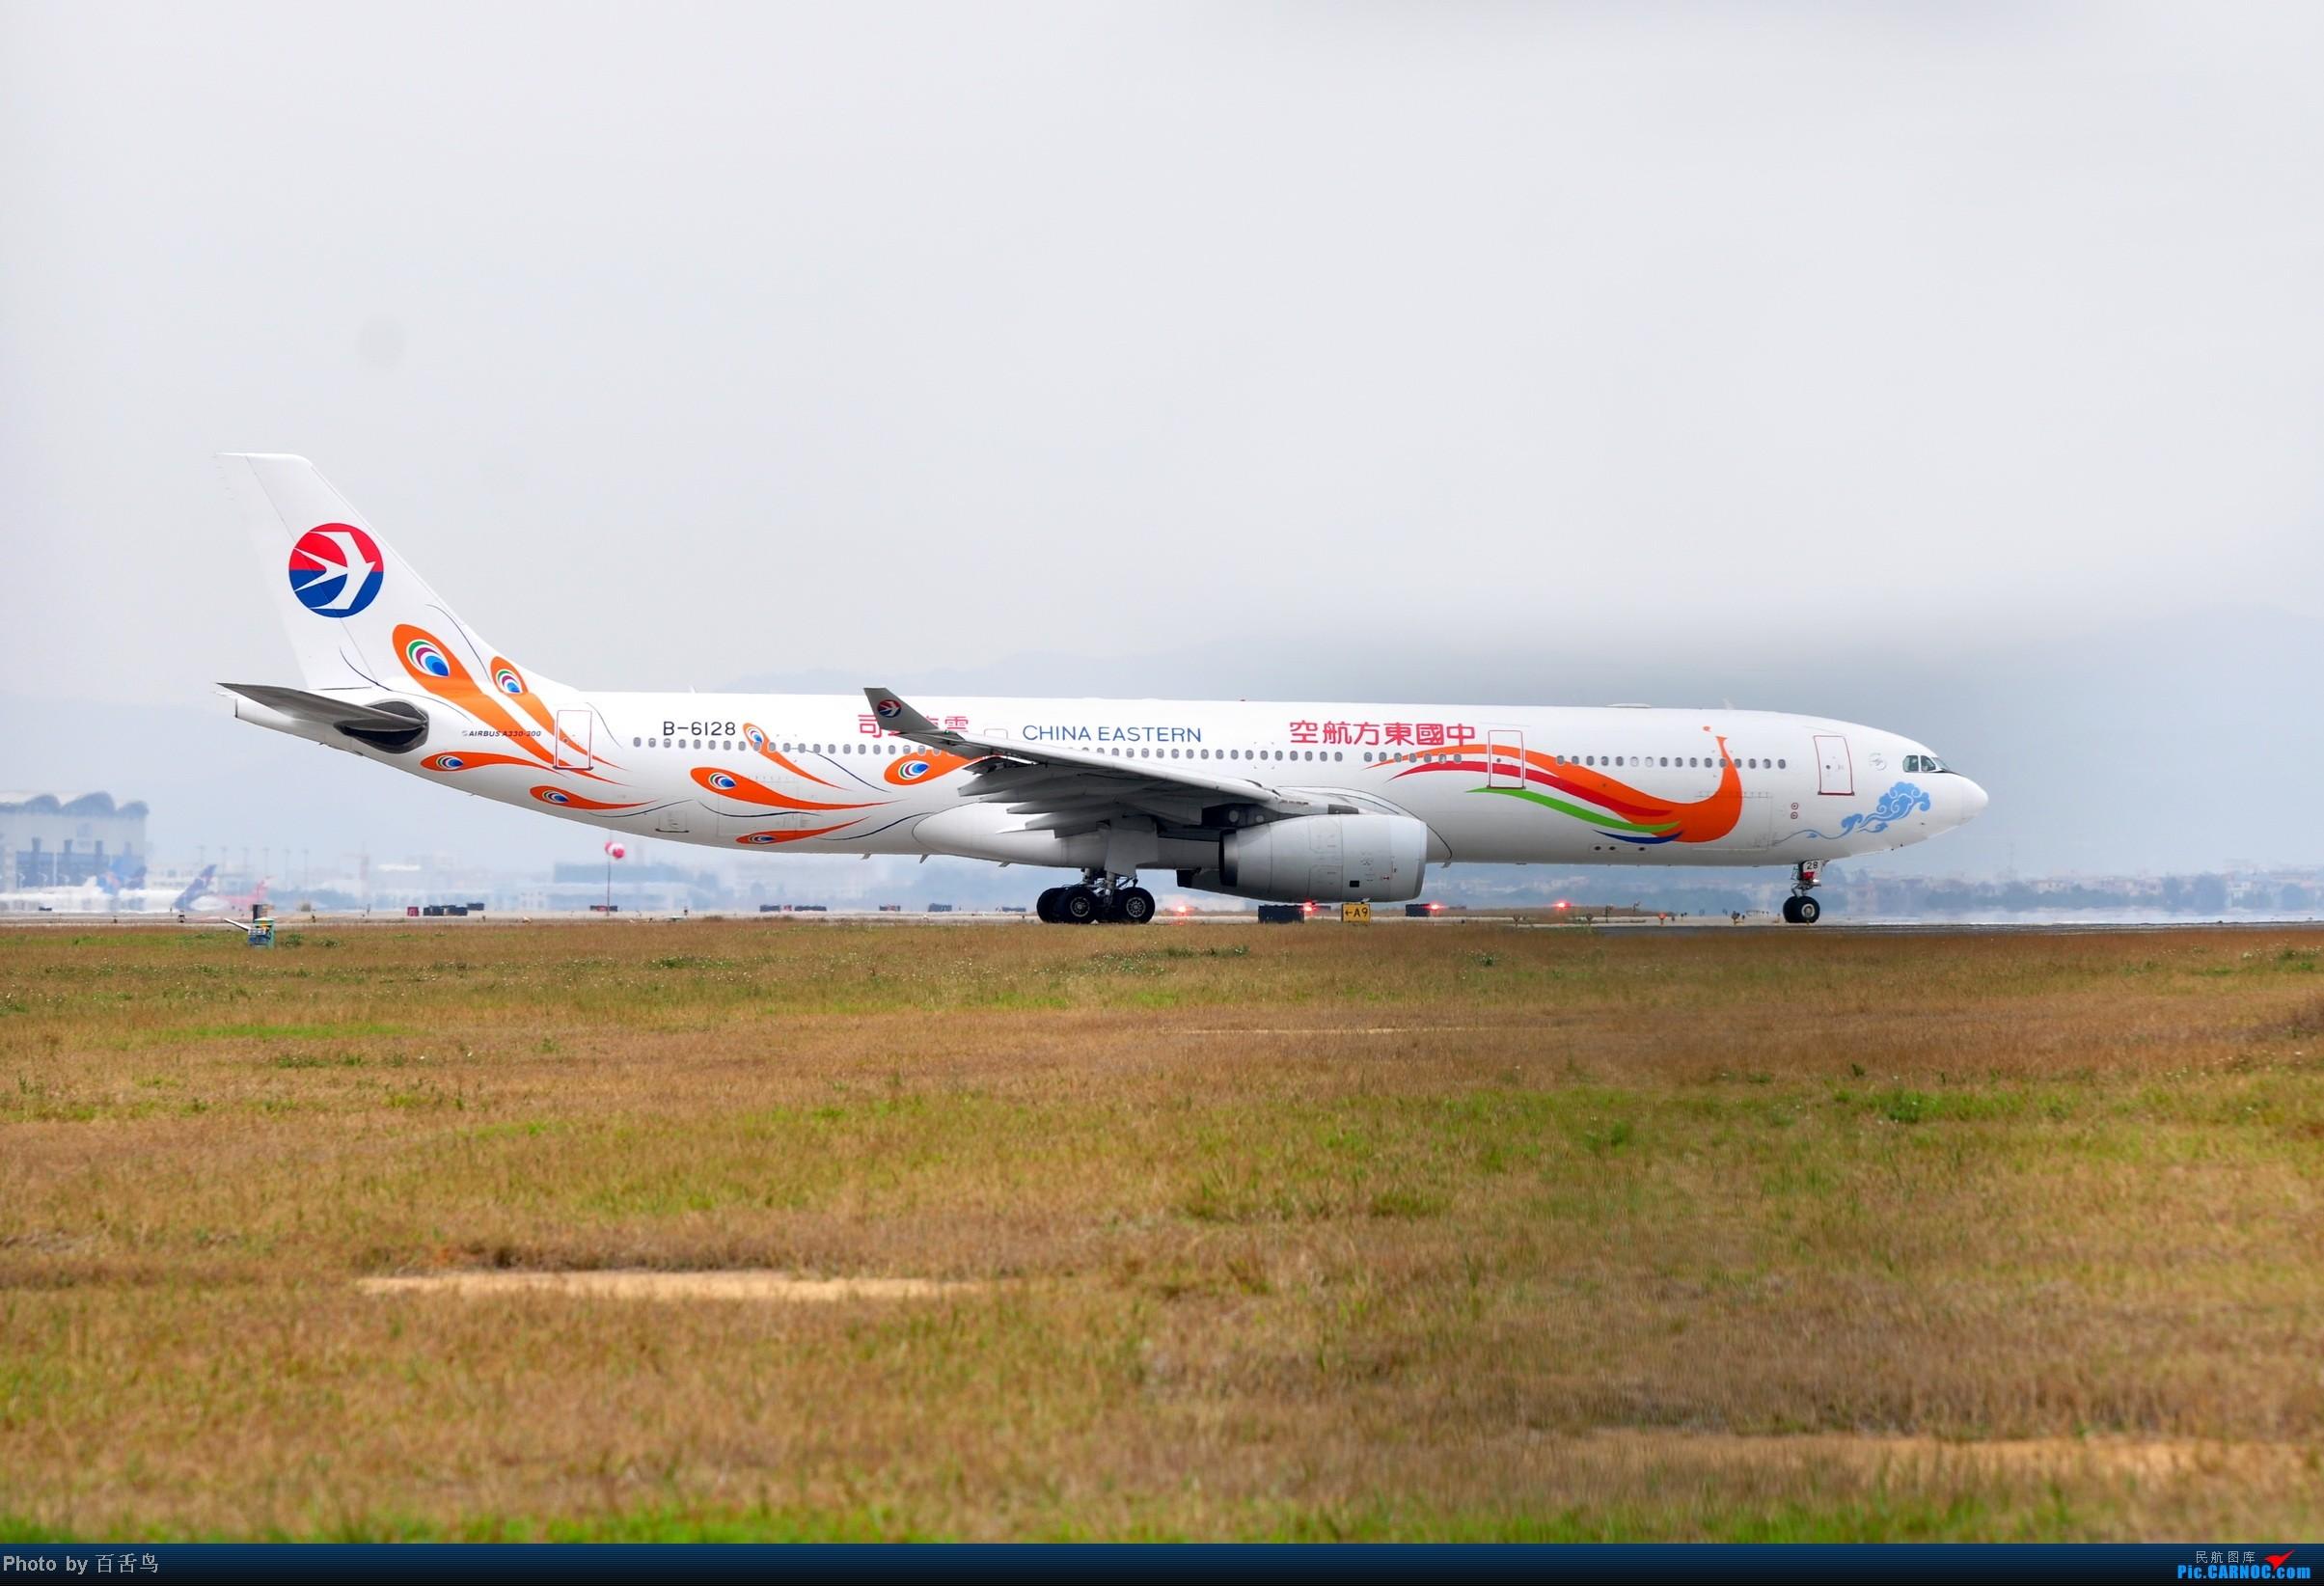 Re:[原创]【白云拍机】追南航773未果,东跑随手拍 AIRBUS A330-300 B-6128 中国广州白云机场